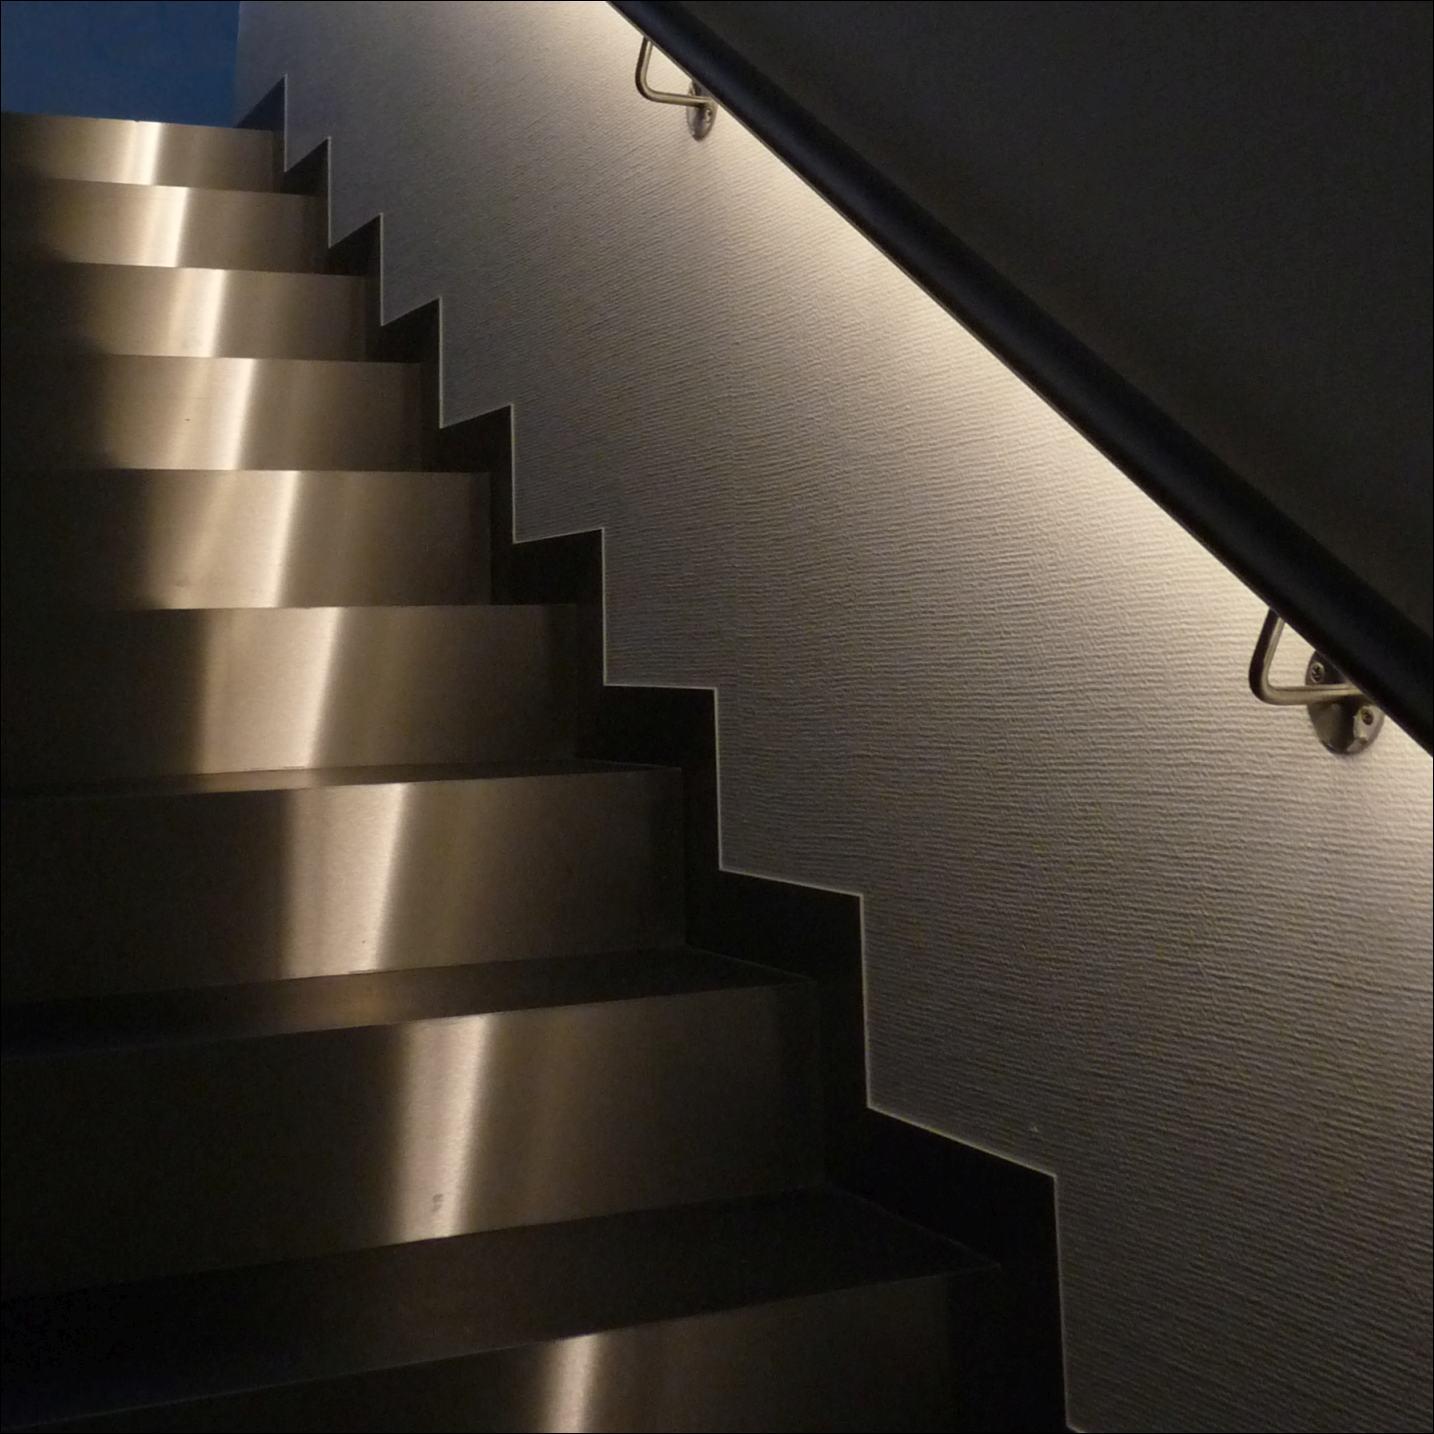 leccor leuchten gmbh news. Black Bedroom Furniture Sets. Home Design Ideas